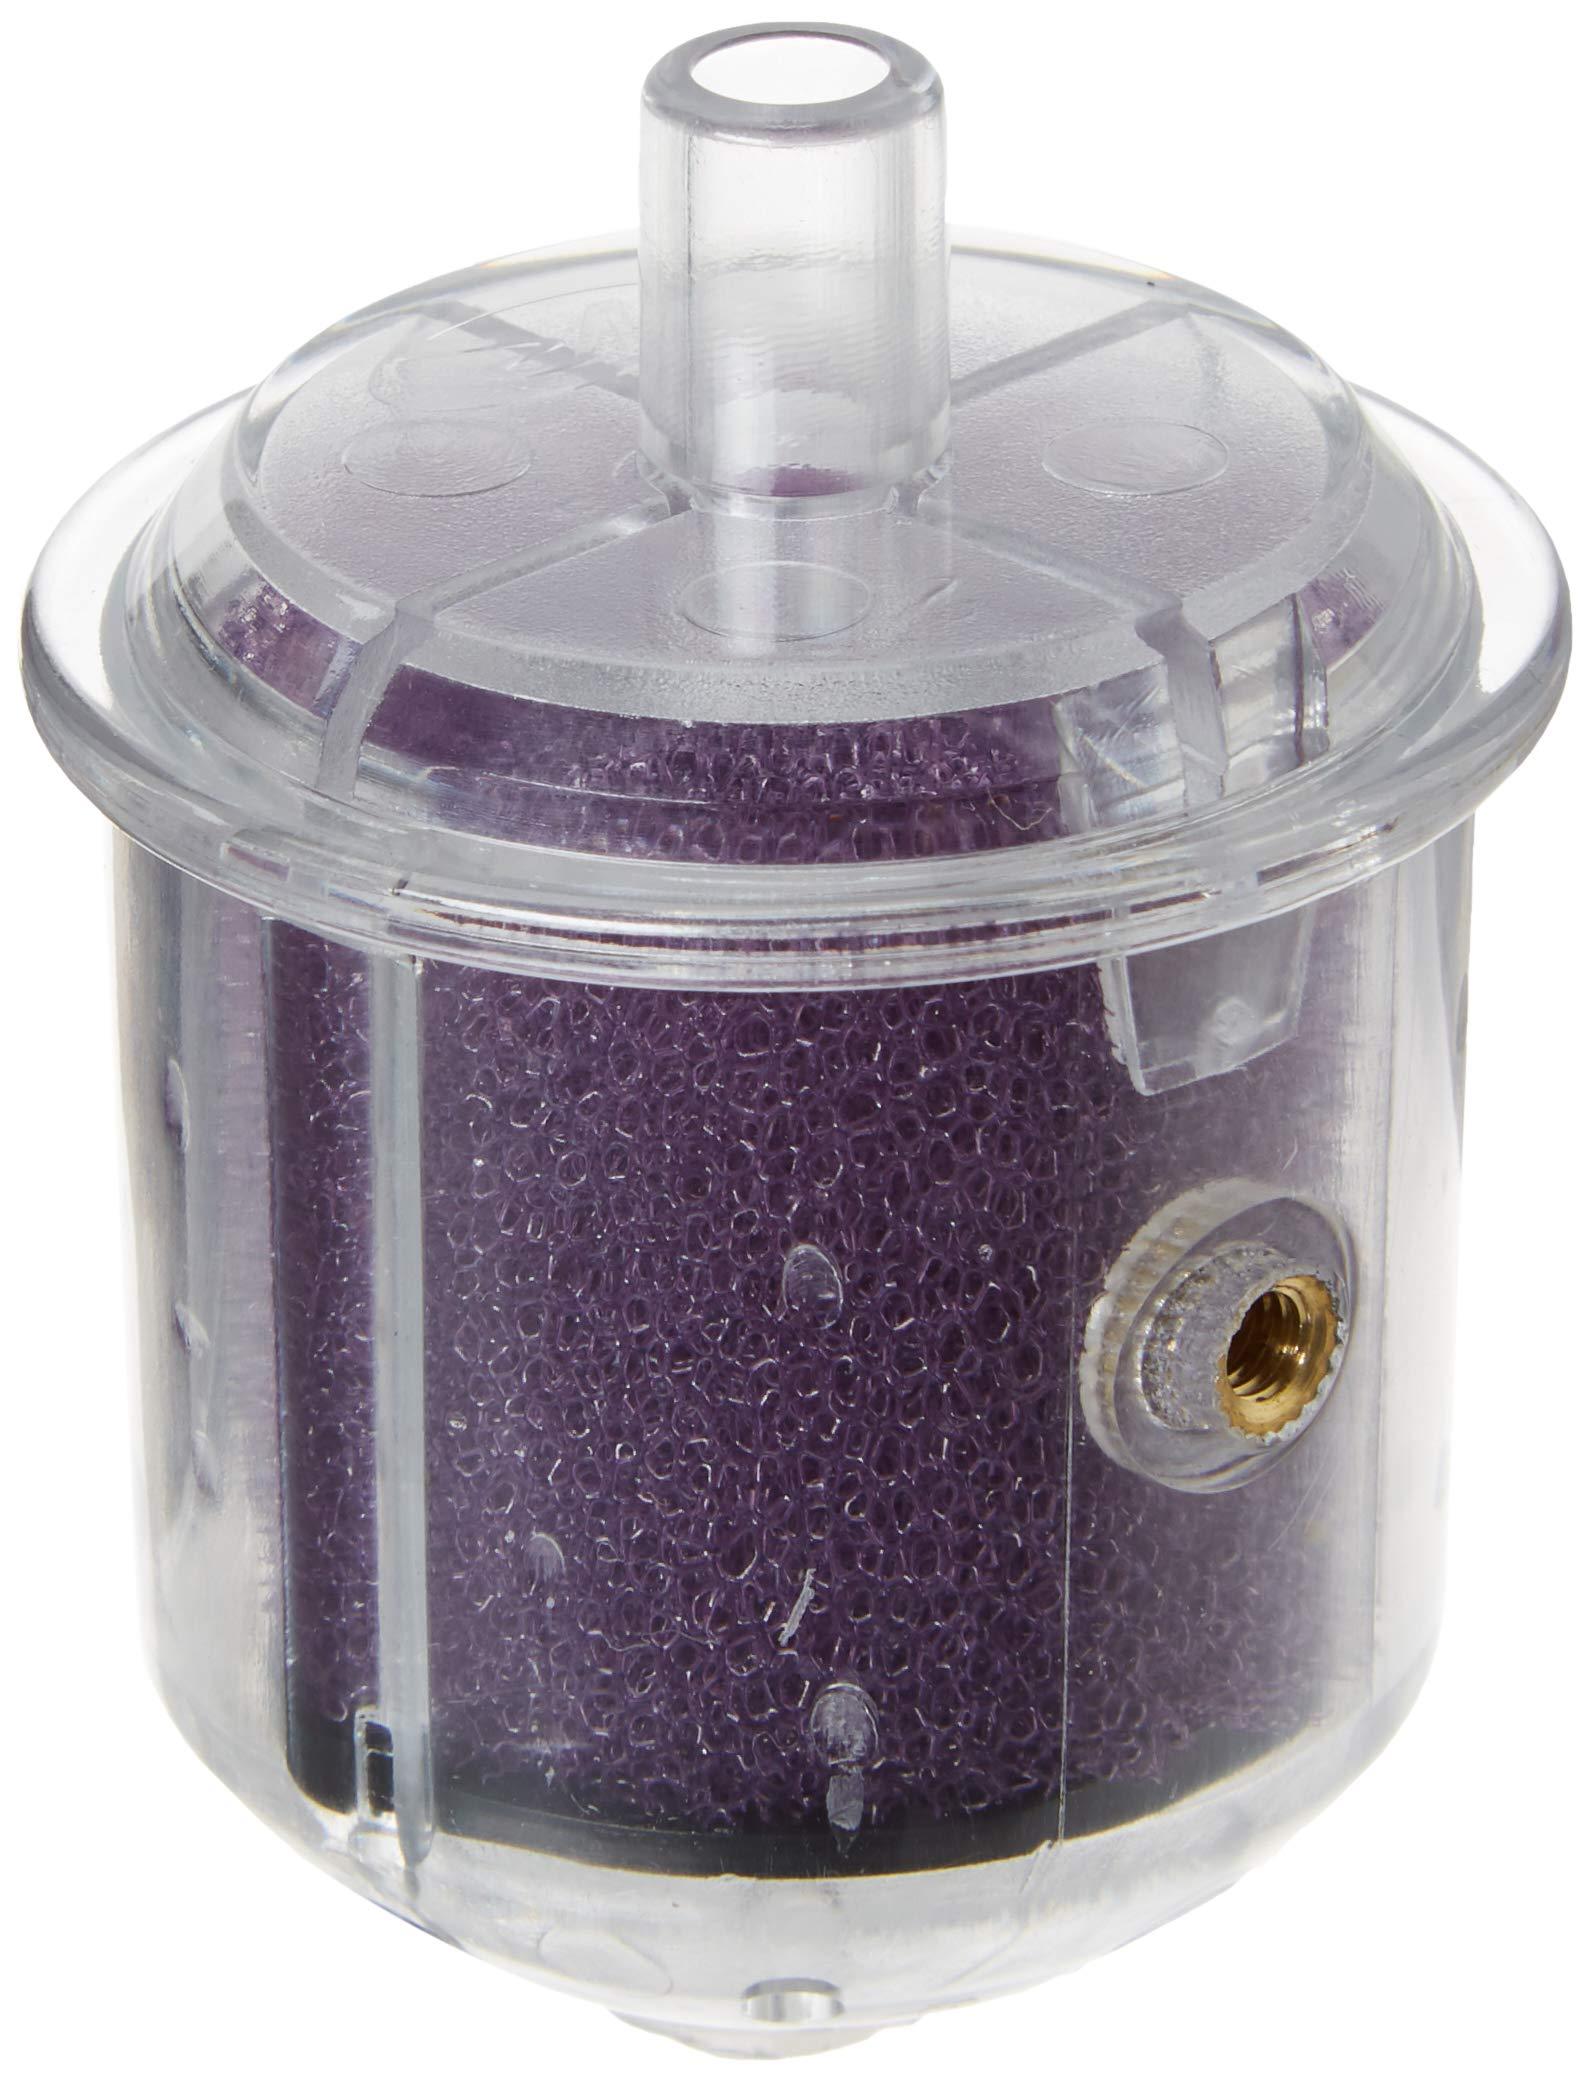 Weapon-R 816-111-105 Super Matrix Breather Filter, Purple